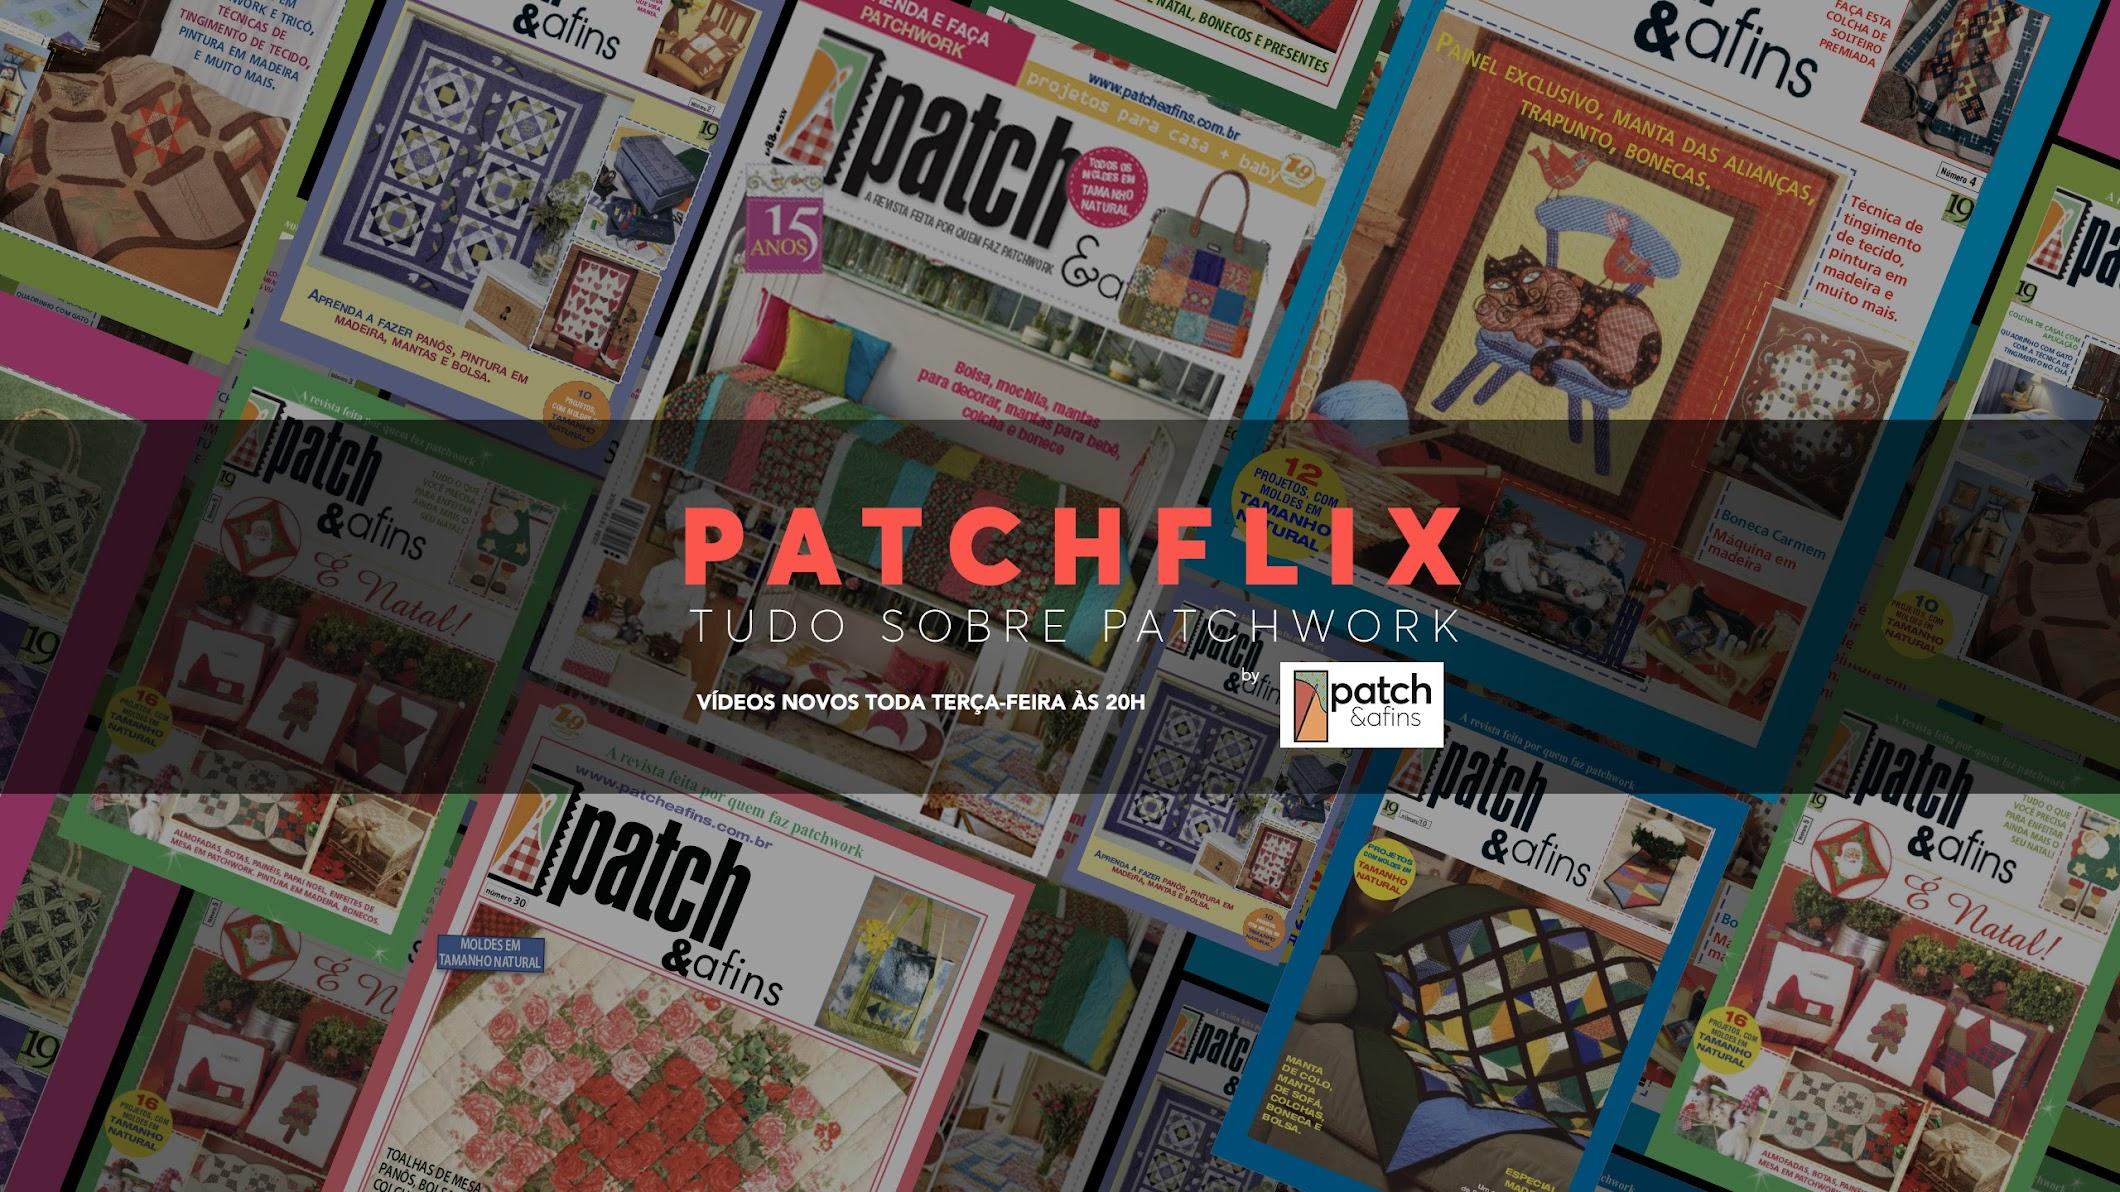 Patchflix - Tudo sobre Patchwork